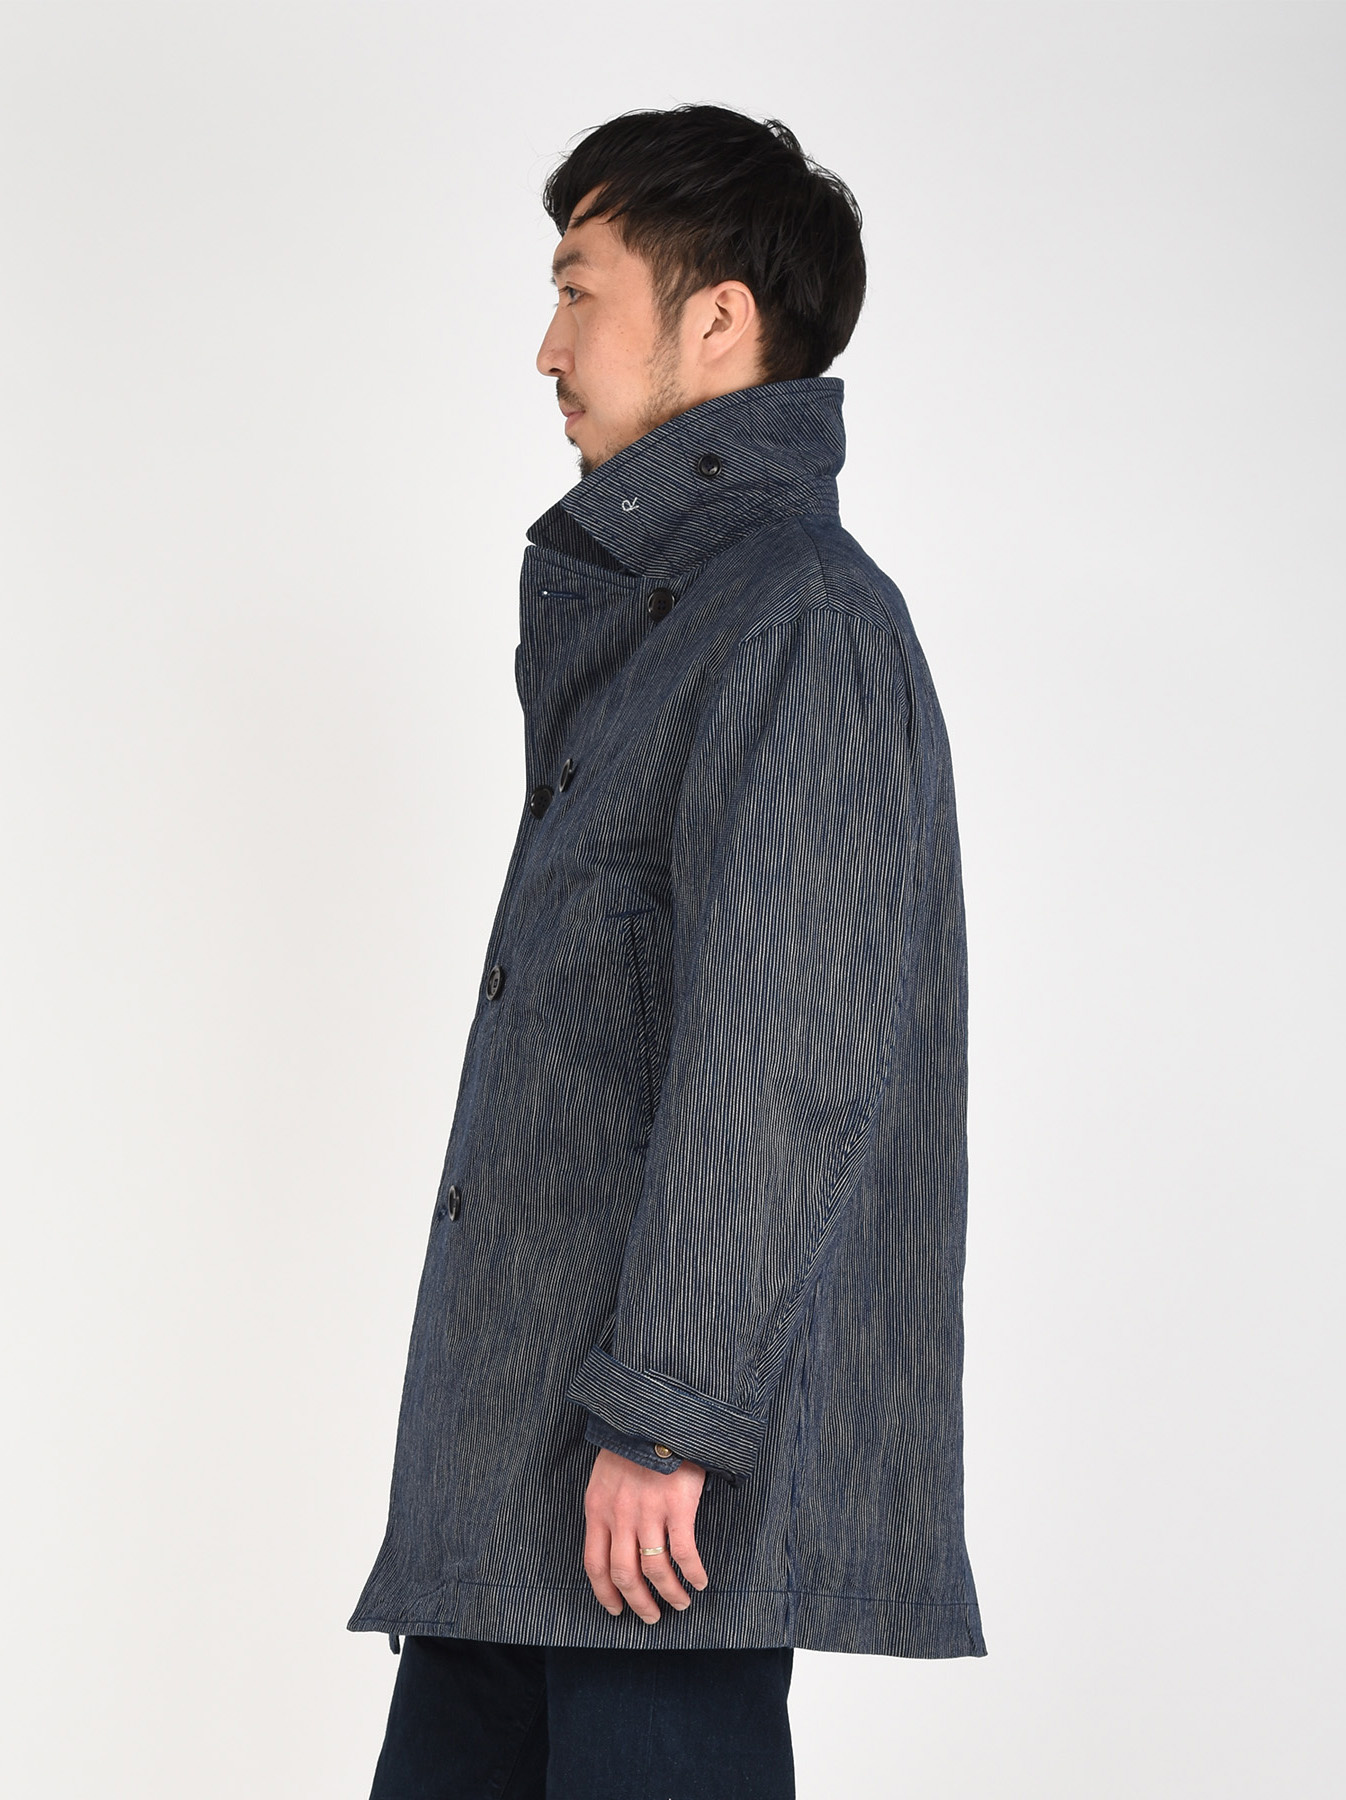 WH Indigo Mugi Yoko-shusi P-coat-5